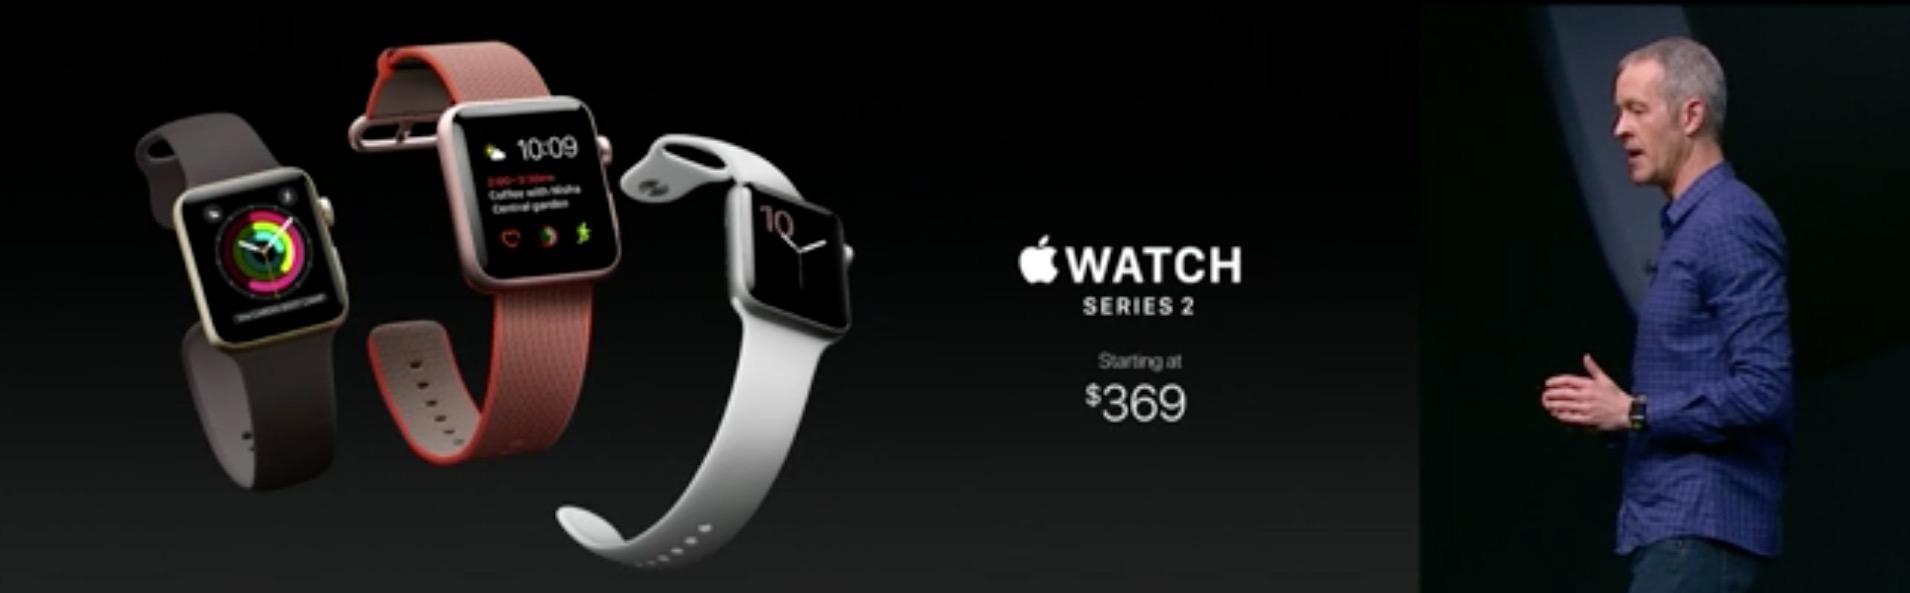 applewatch_series2-6